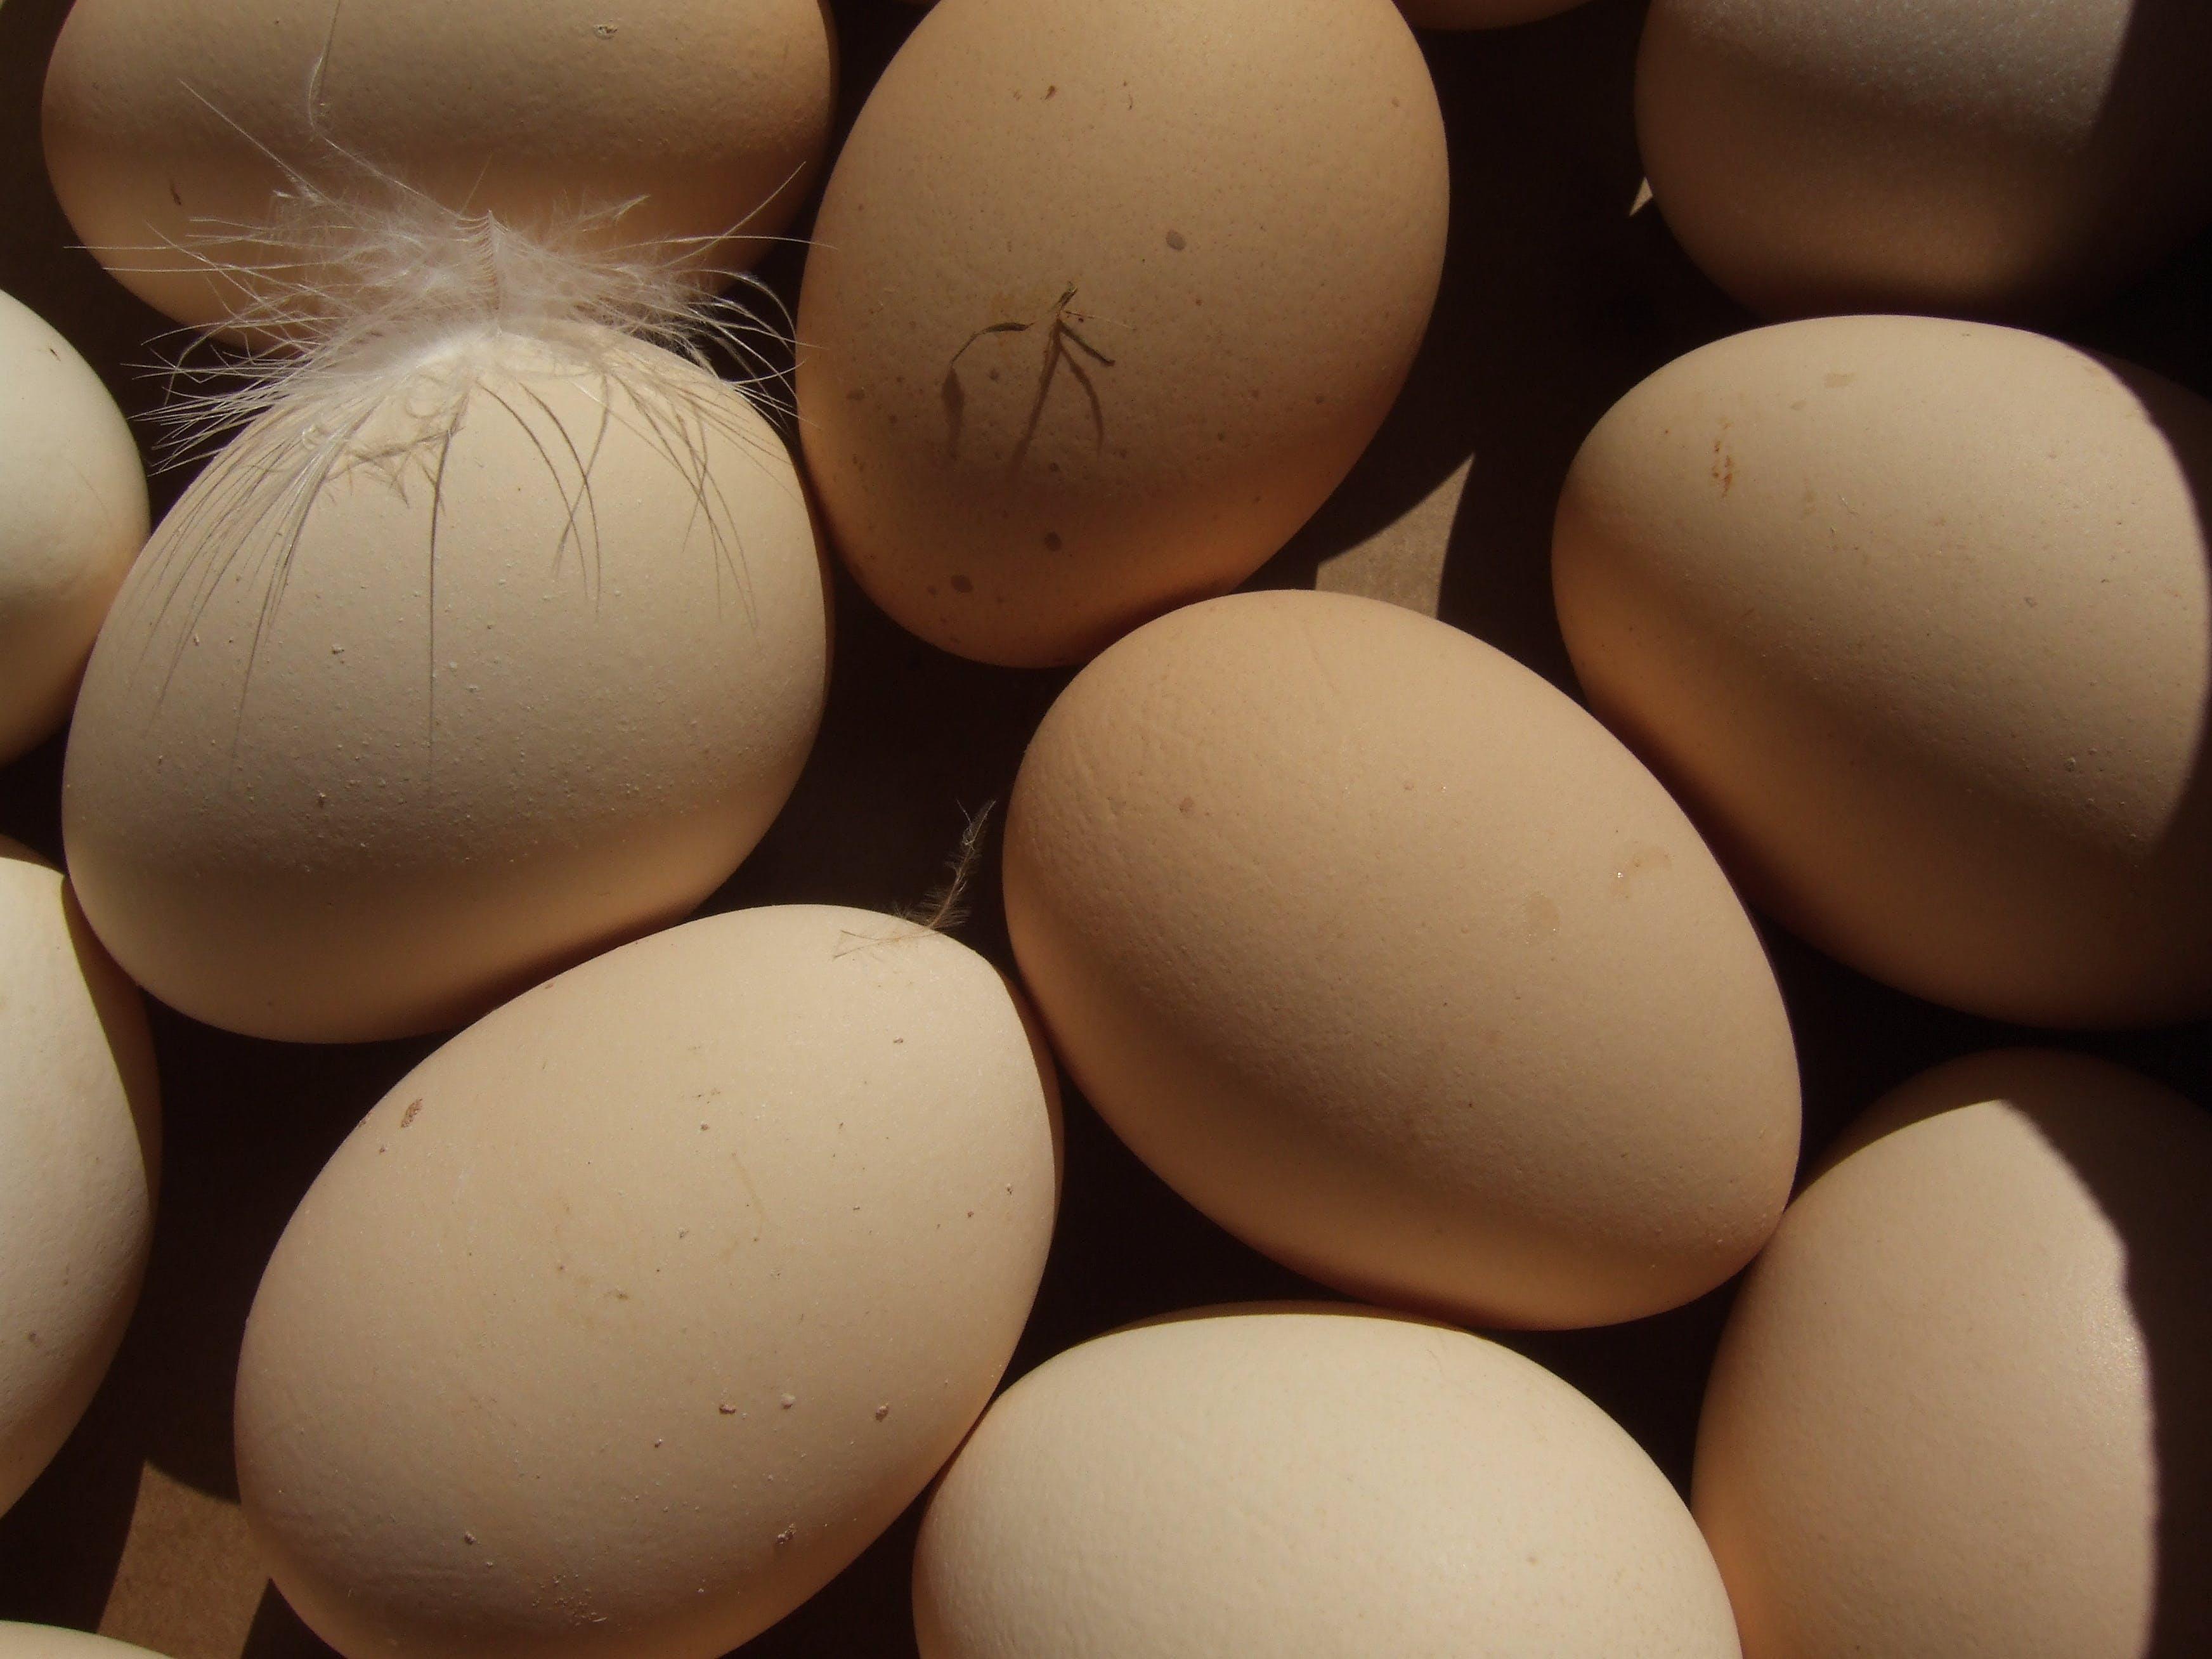 Free stock photo of field, eggs, market, bio